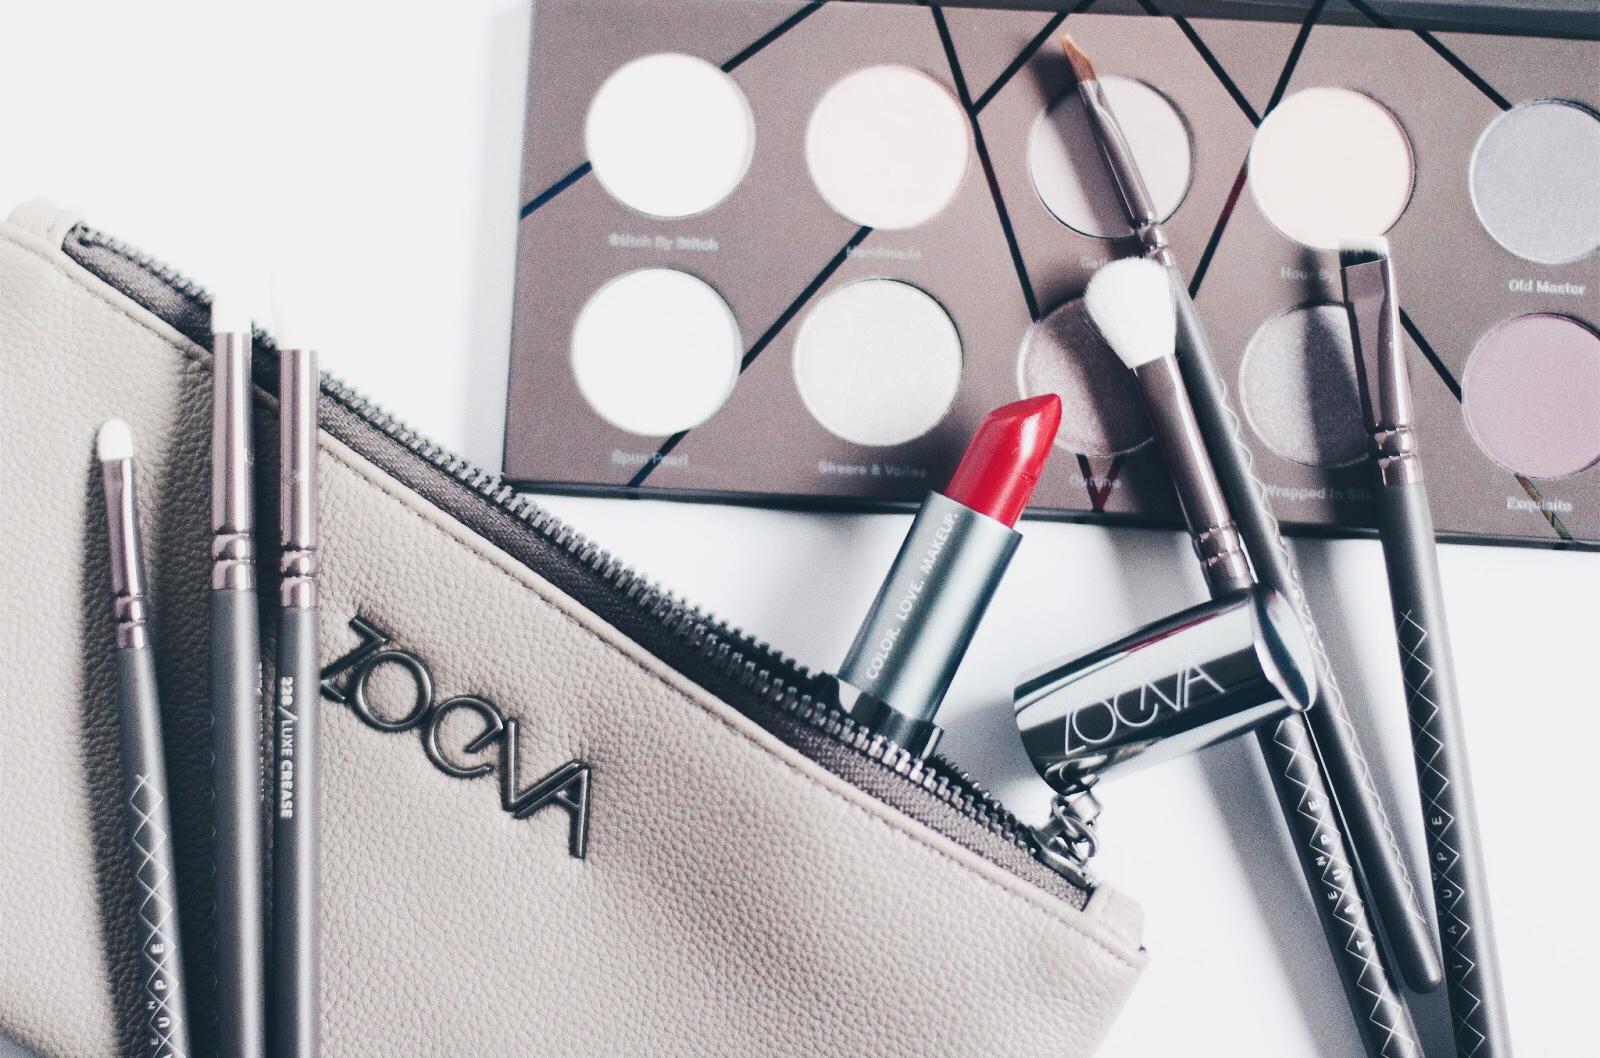 zoeva pinceaux maquillage arrive chez Sephora